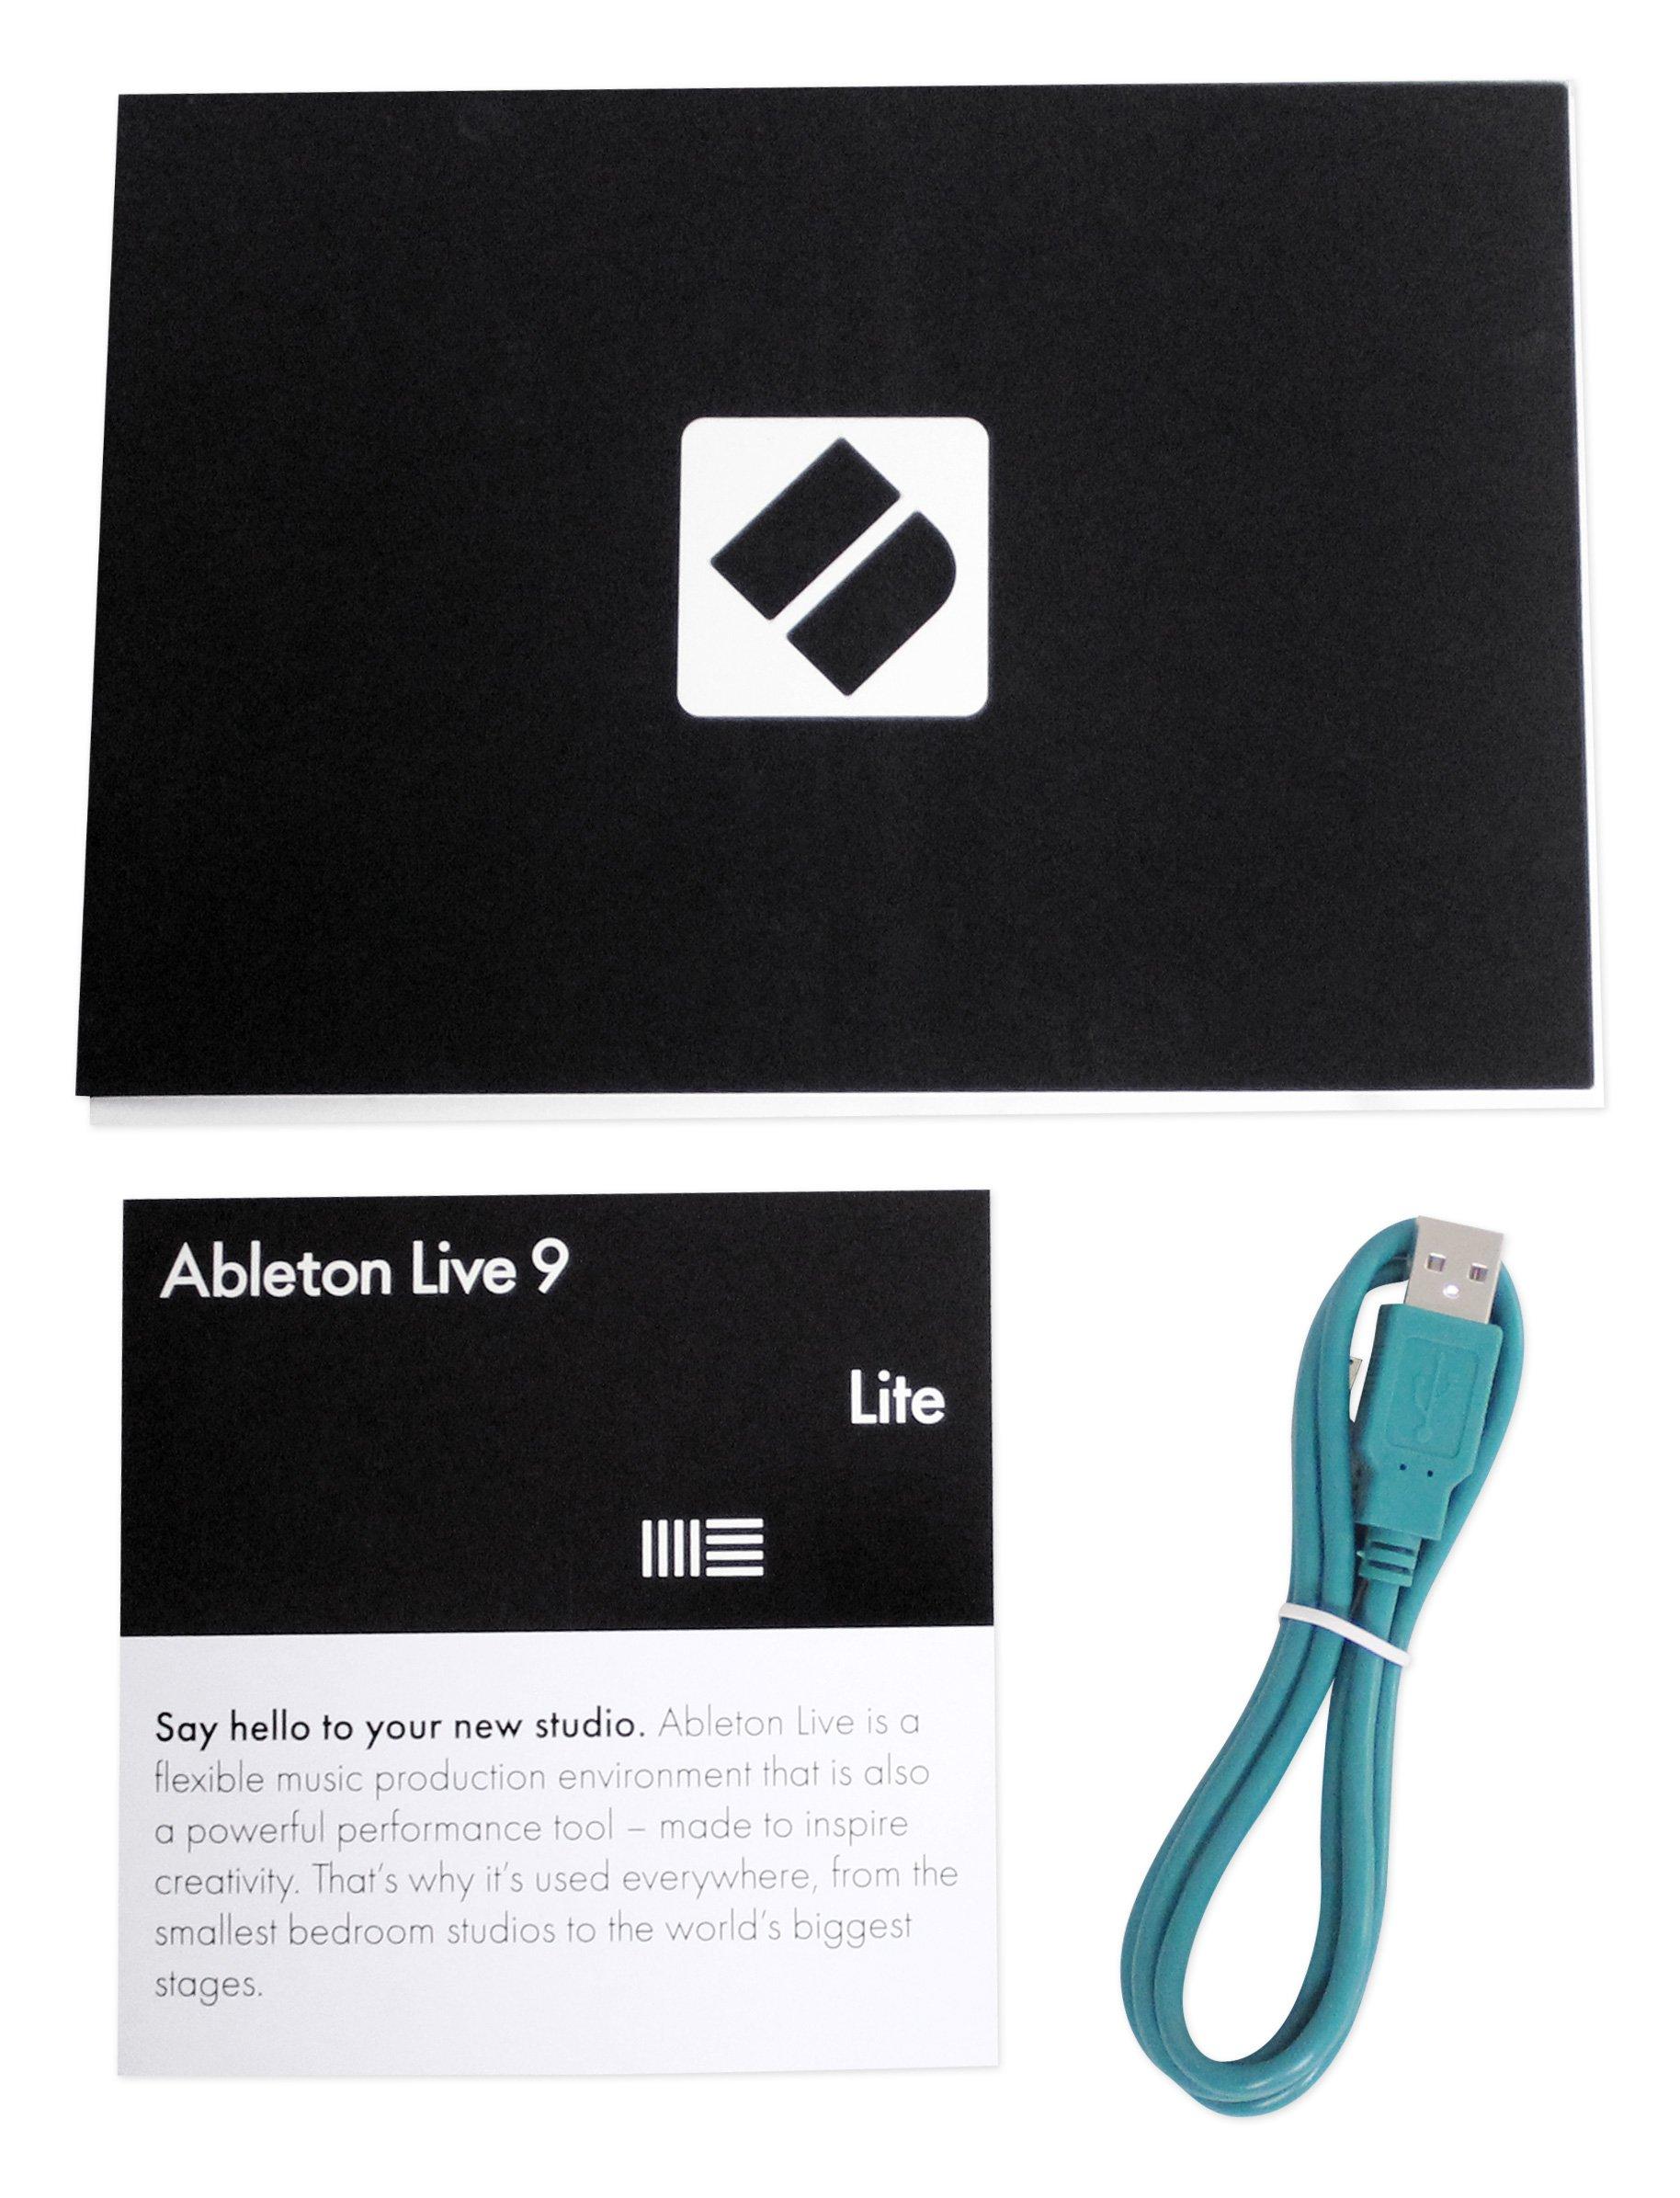 Novation LAUNCHKEY MINI MK2 25 Key USB Keyboard Controller+Bluetooth Speaker by Nov (Image #6)